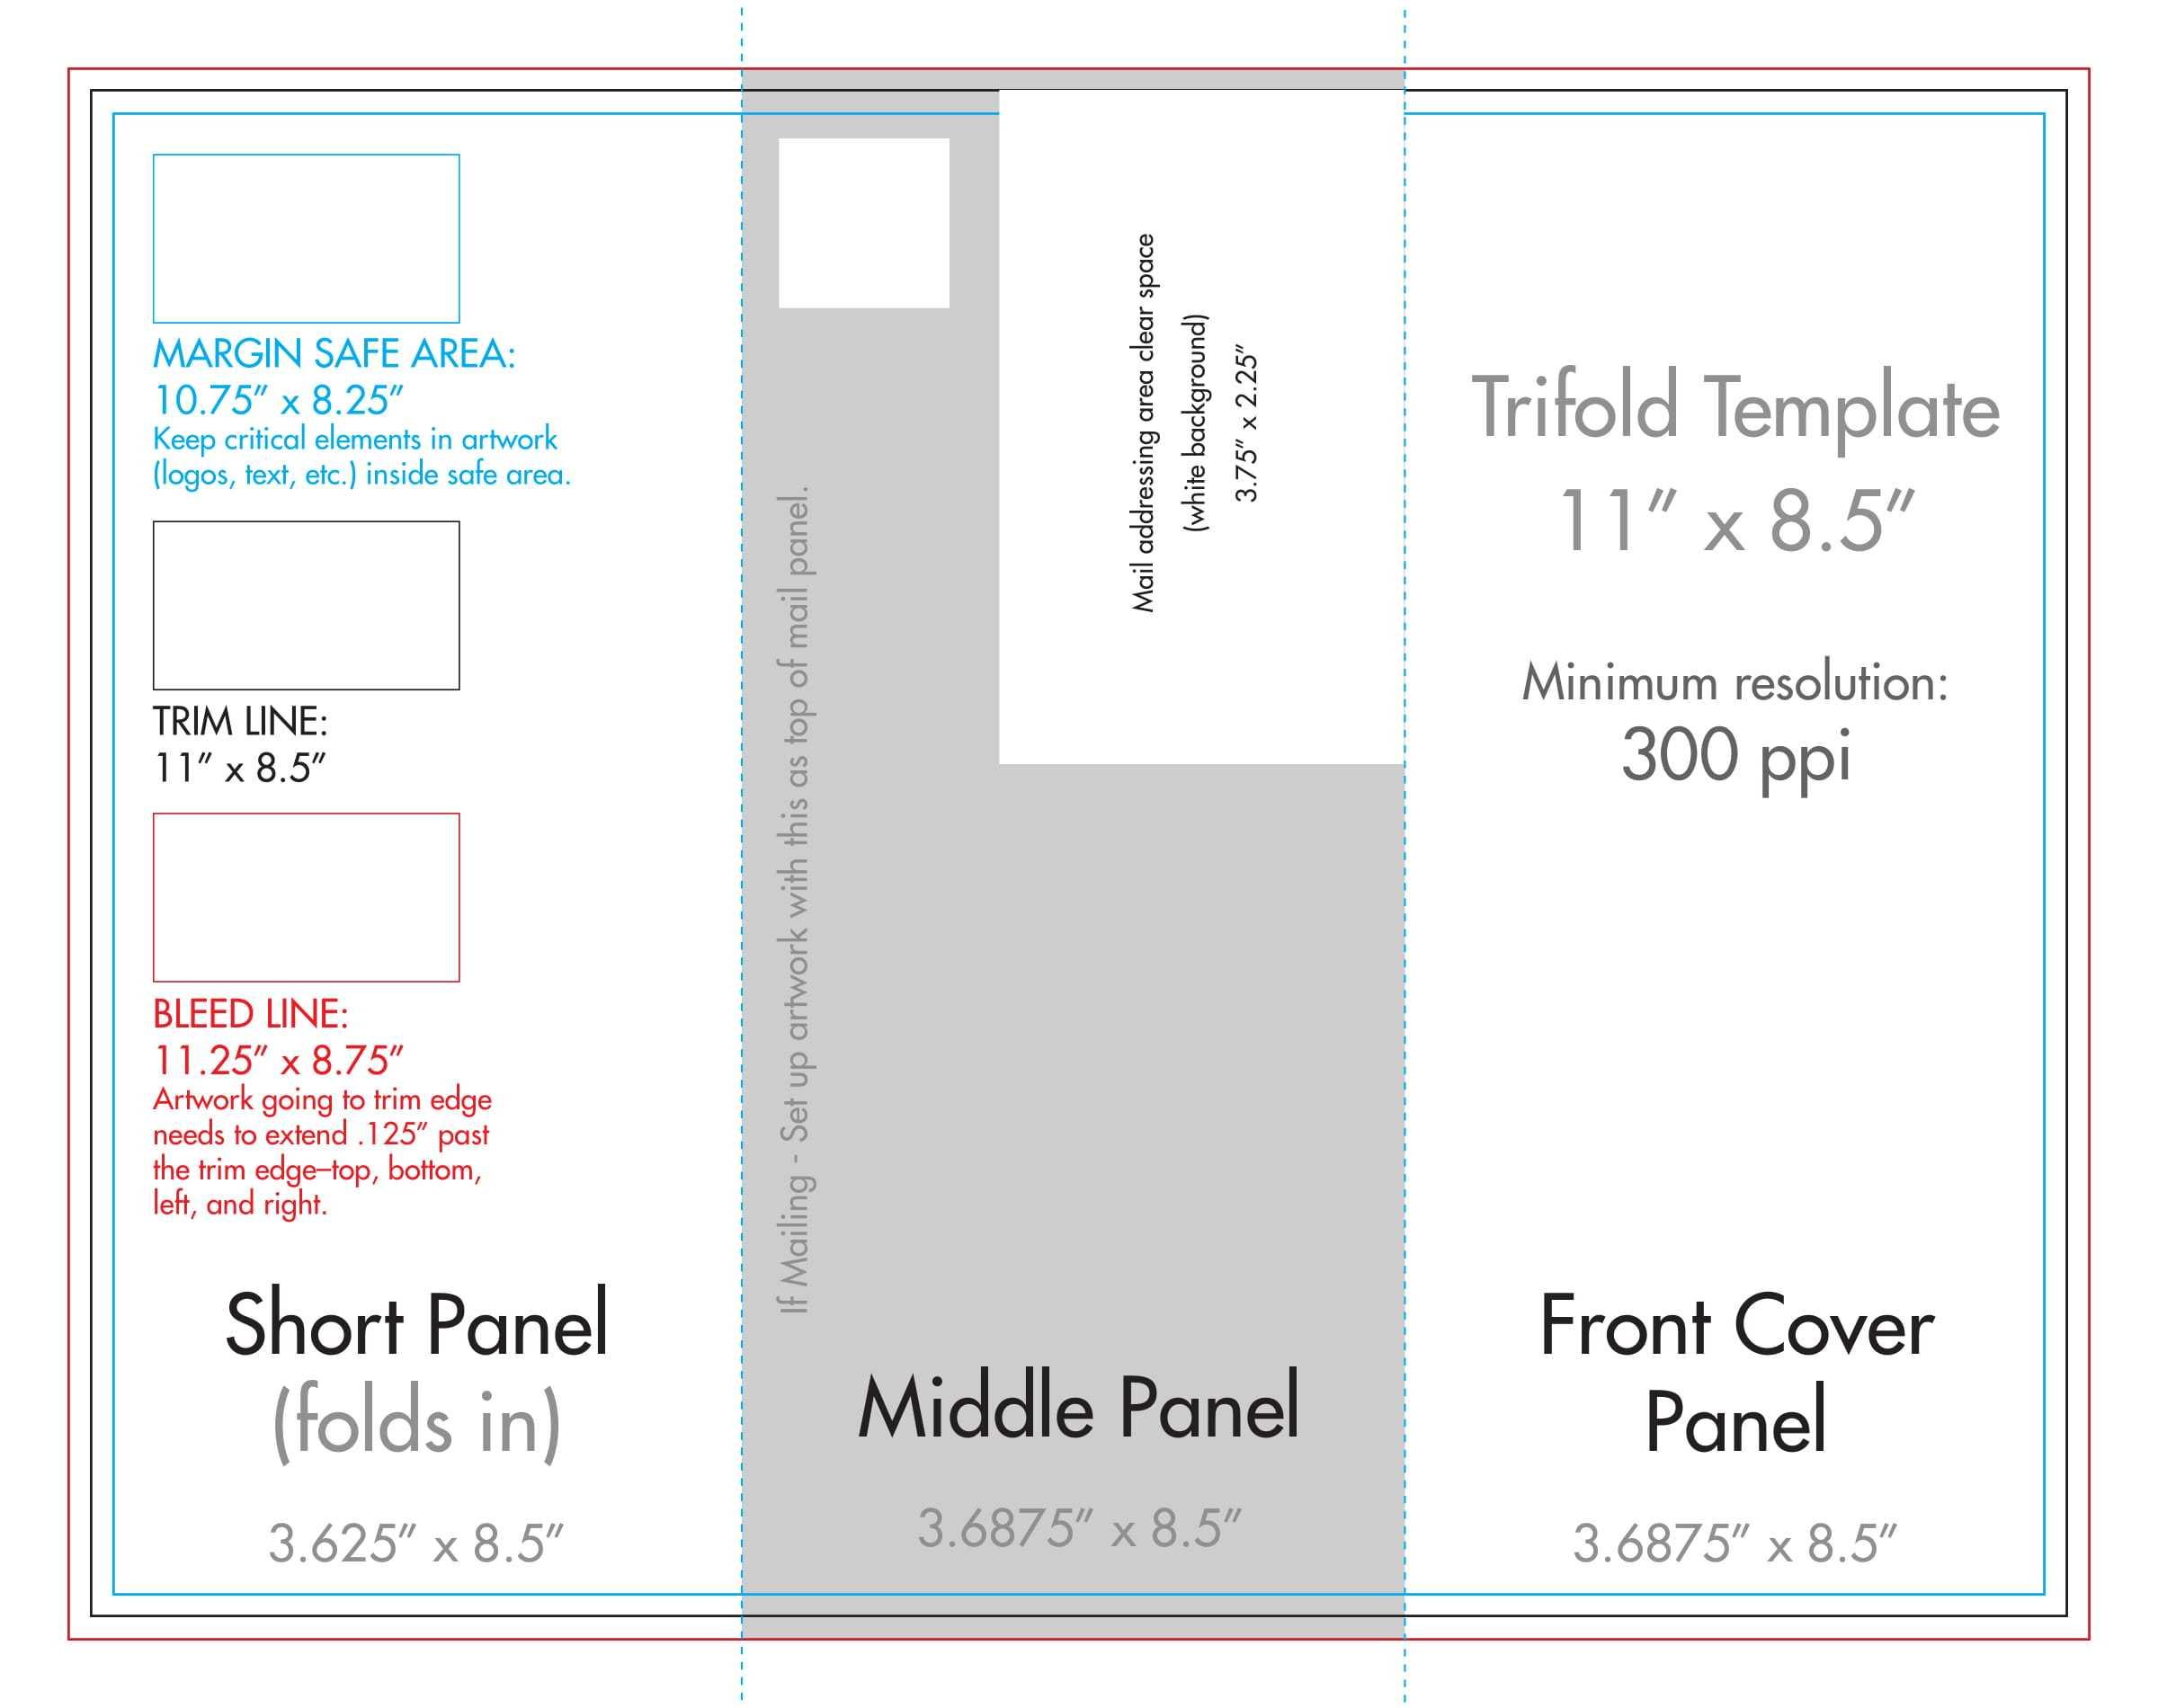 "8.5"" X 11"" Tri Fold Brochure Template - U.s. Press Within 8.5 X11 Brochure Template"